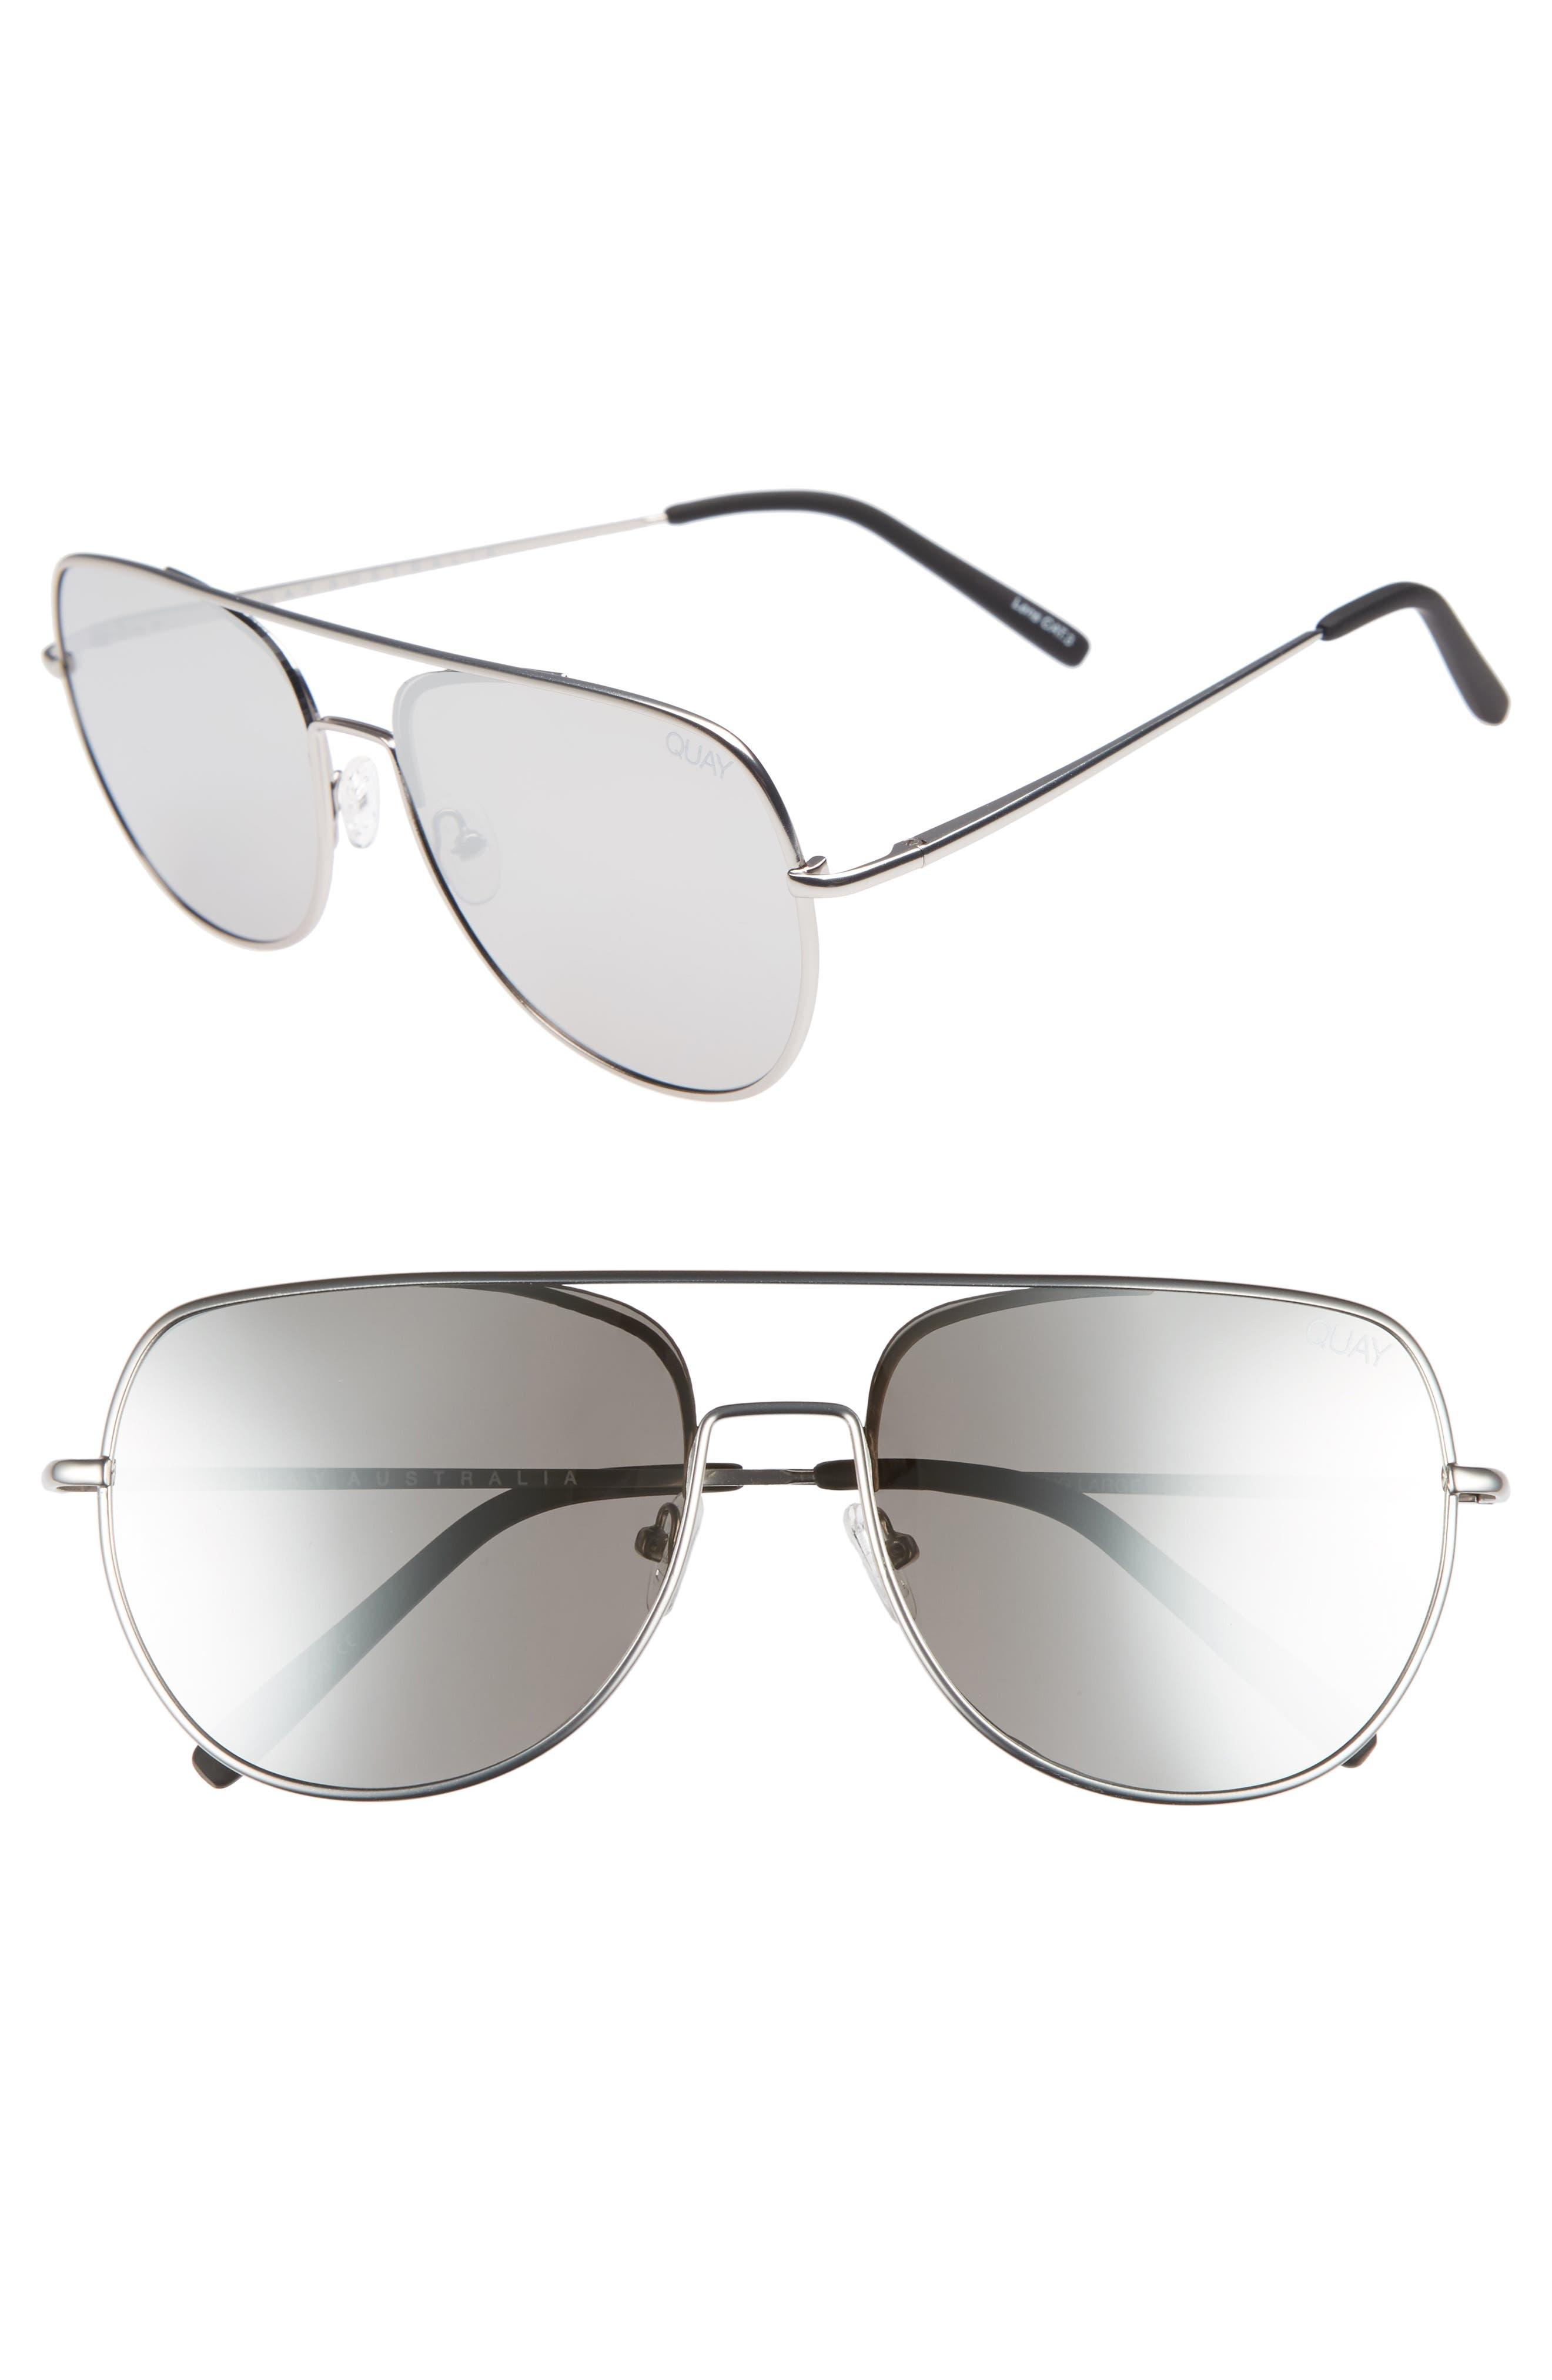 Quay Australia Living Large 5m Aviator Sunglasses - Silver